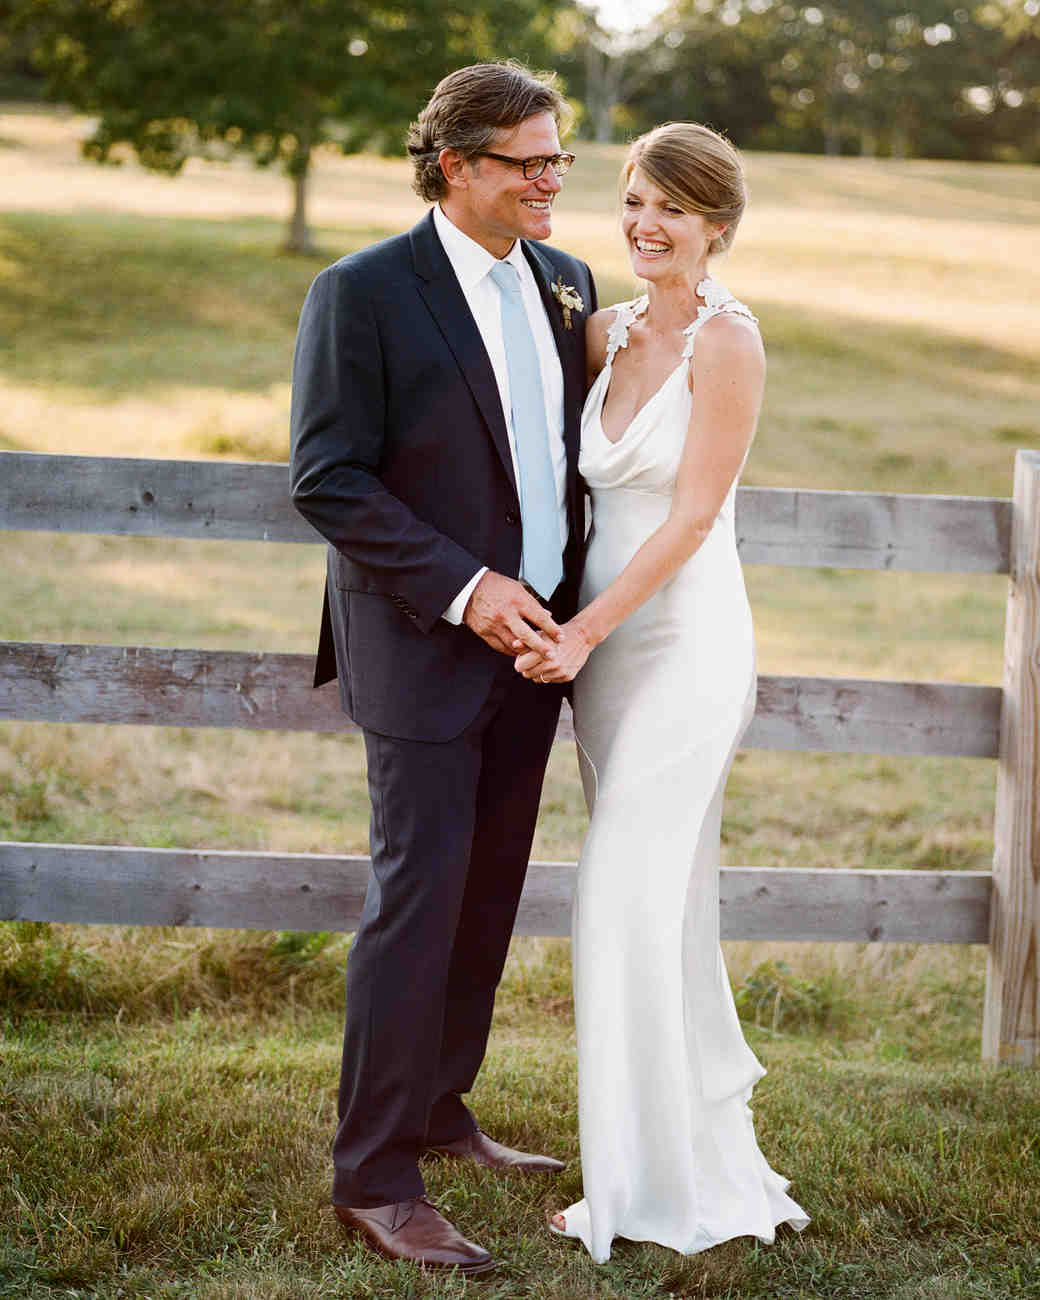 Jocelyn and Graham's Elegant Martha's Vineyard Wedding